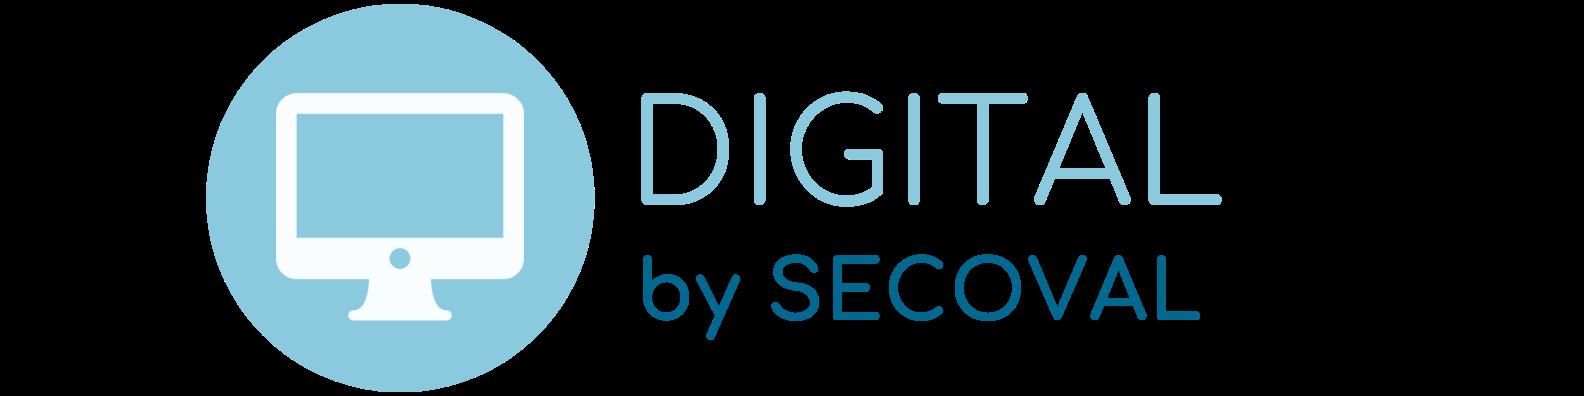 digital by secoval